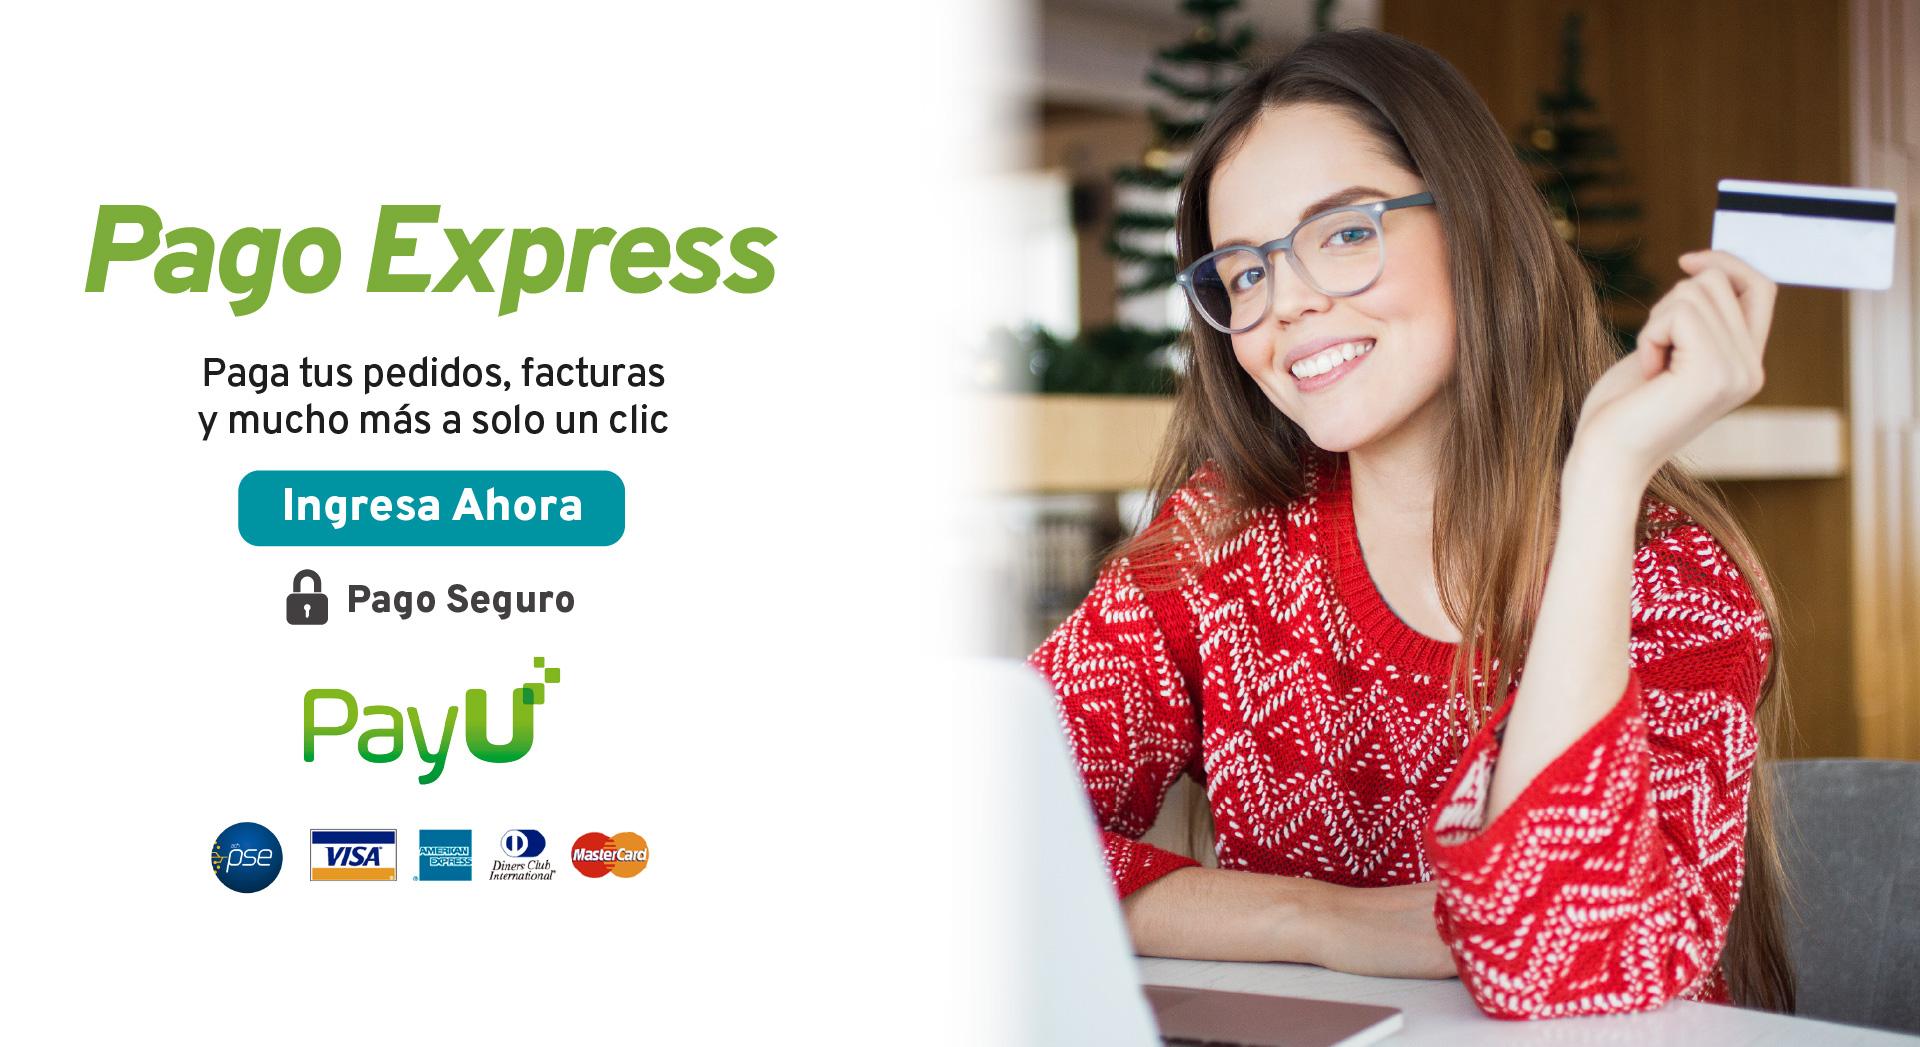 Pago-express